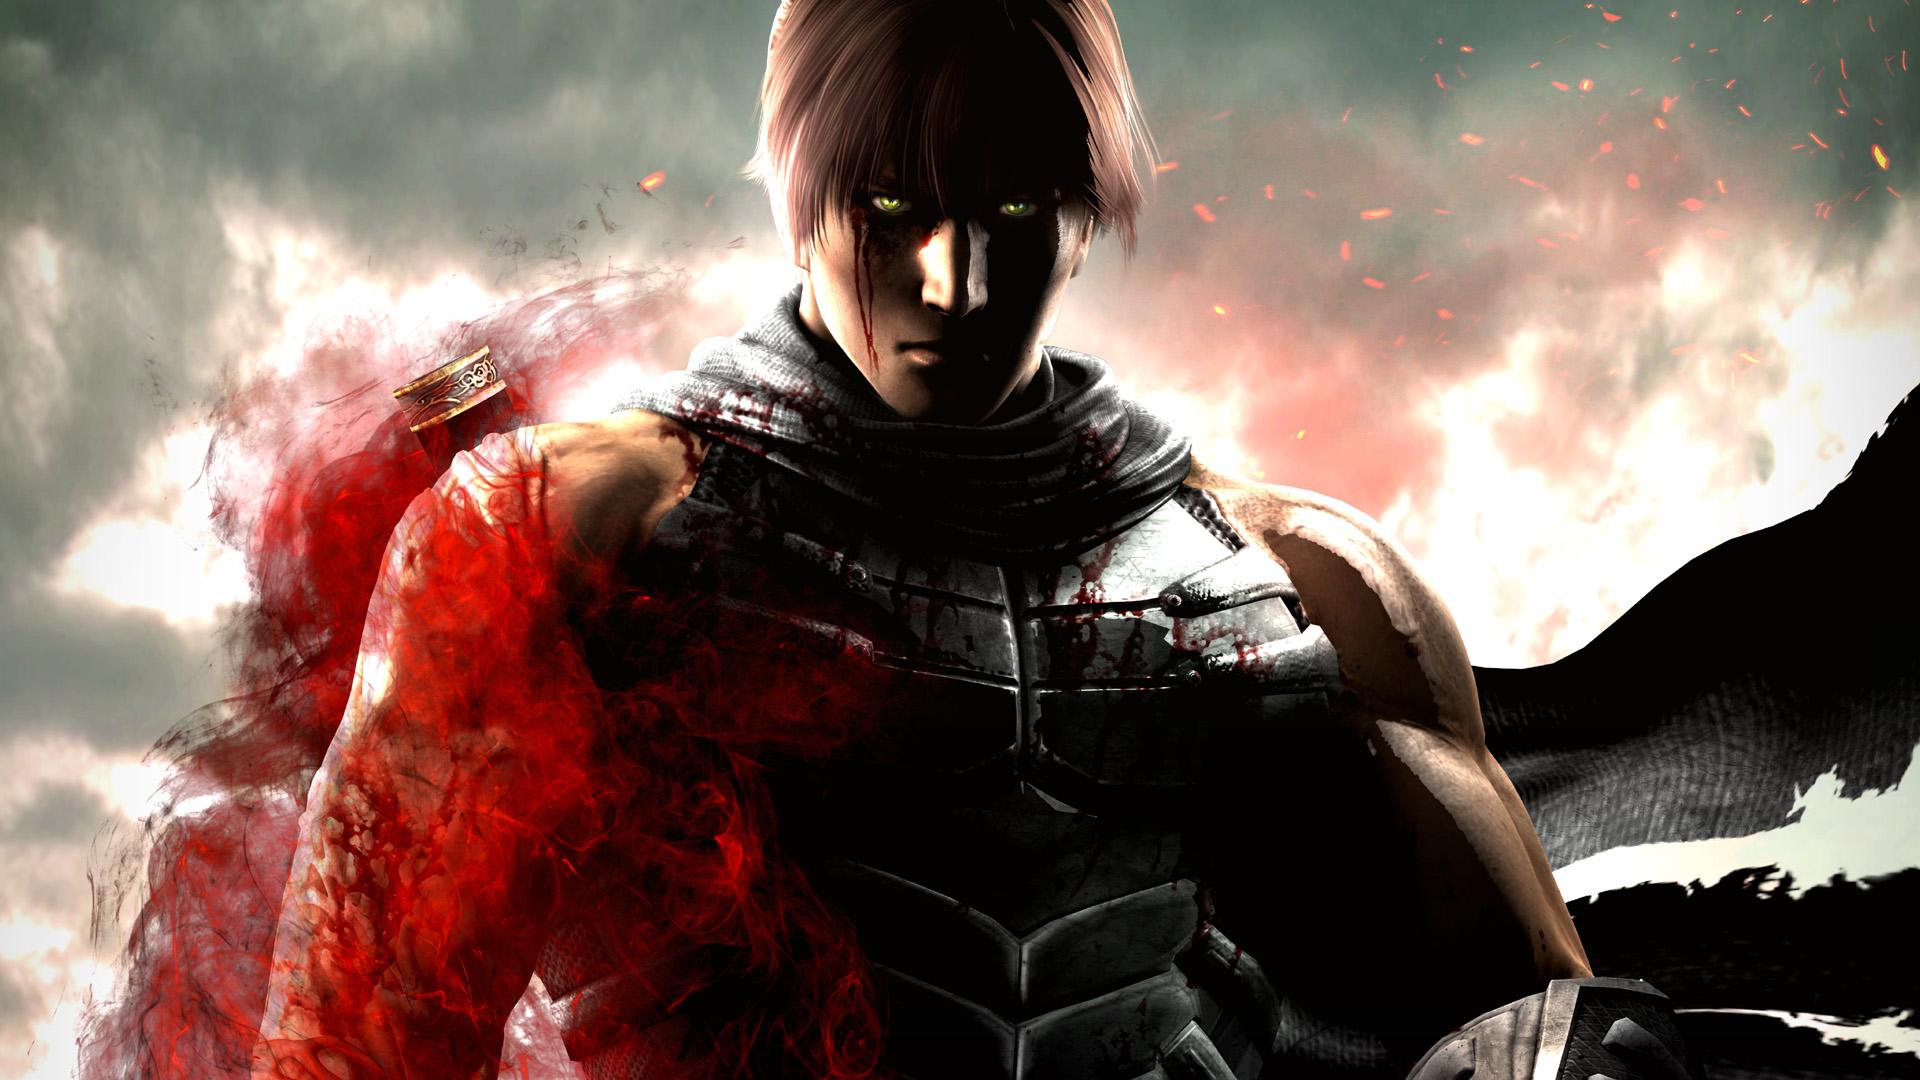 Ninja gaiden fantasy anime warrior blood b wallpaper - Ninja anime wallpaper ...